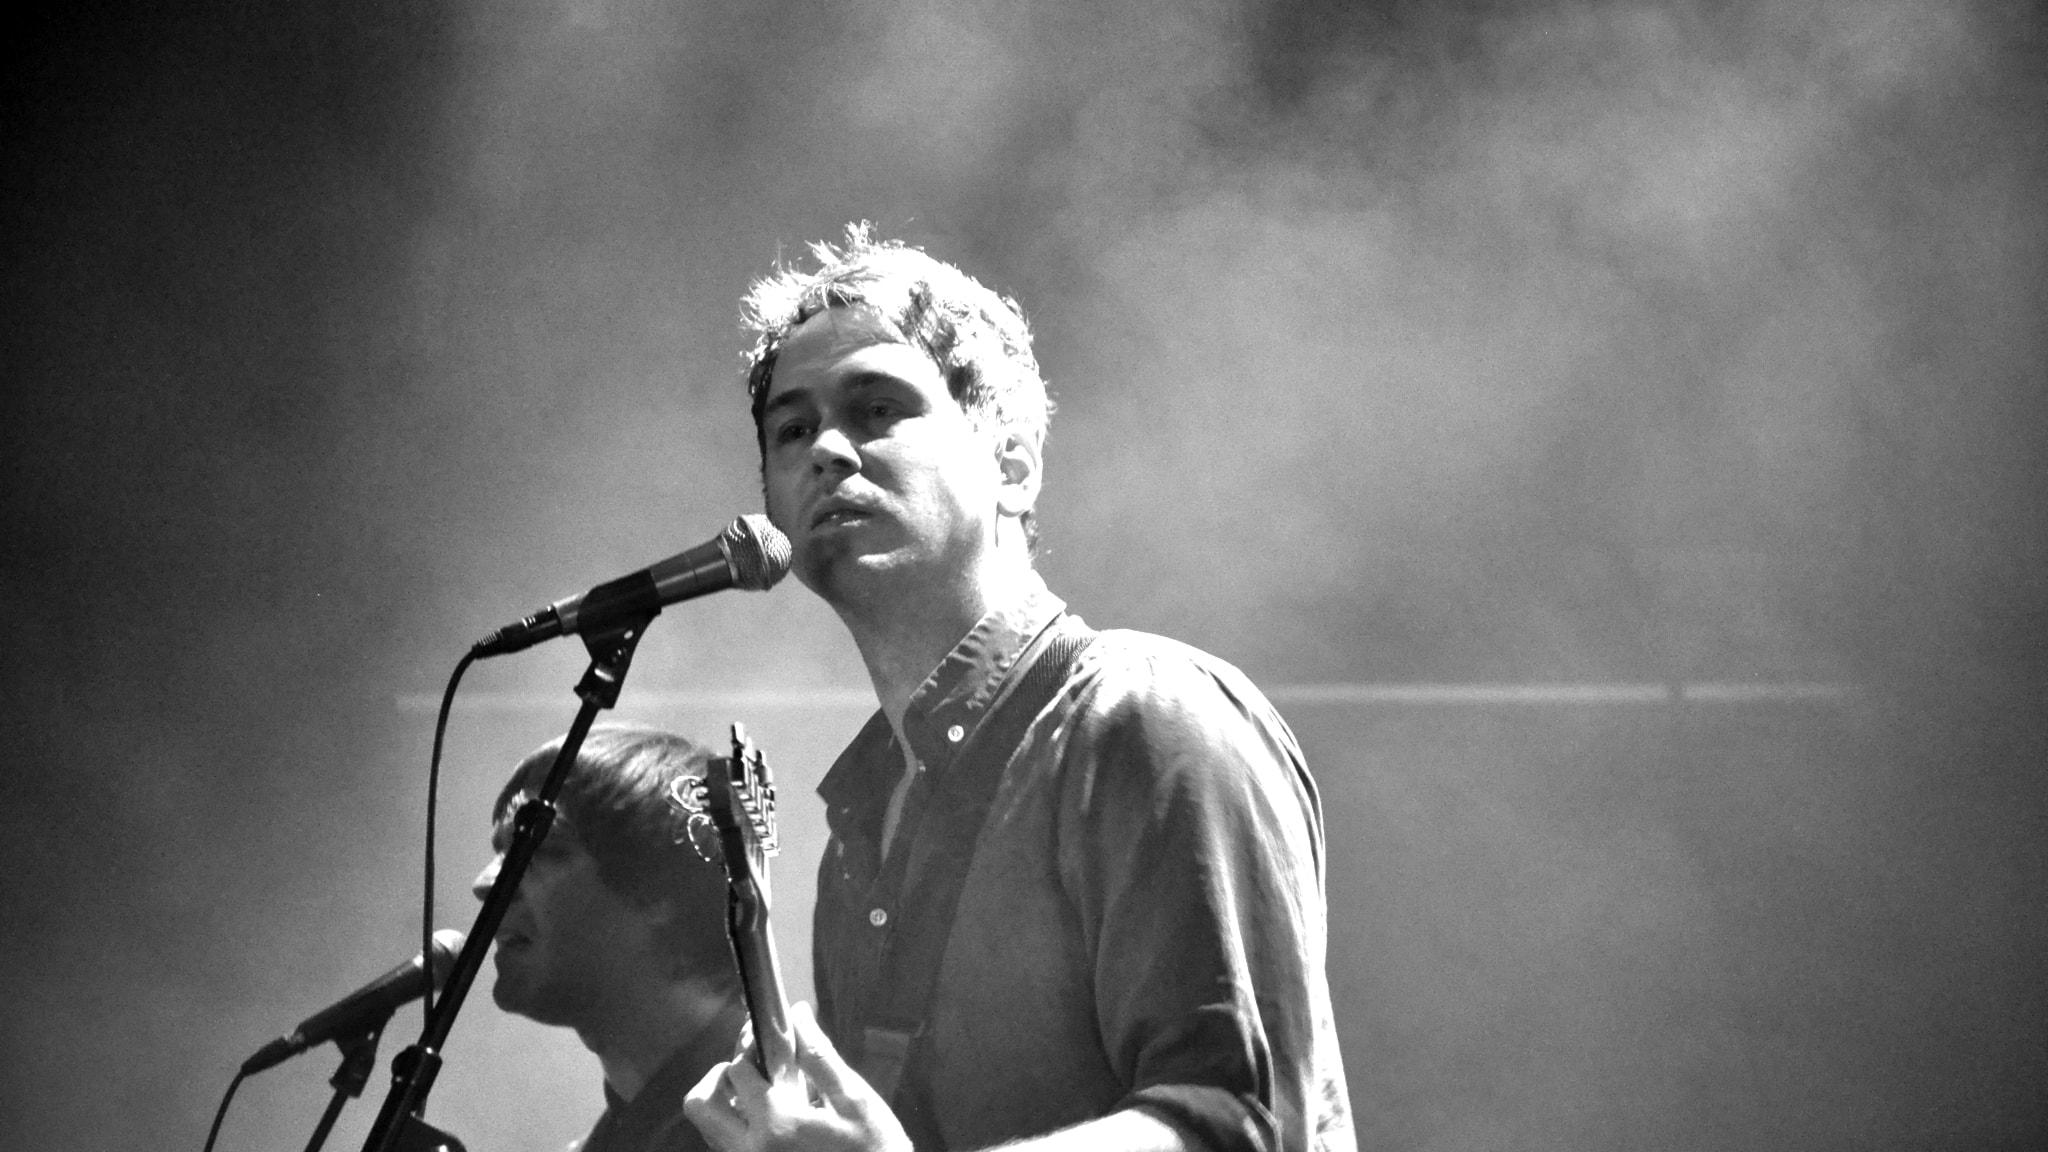 Joel Alme, turnépremiär i Göteborg!